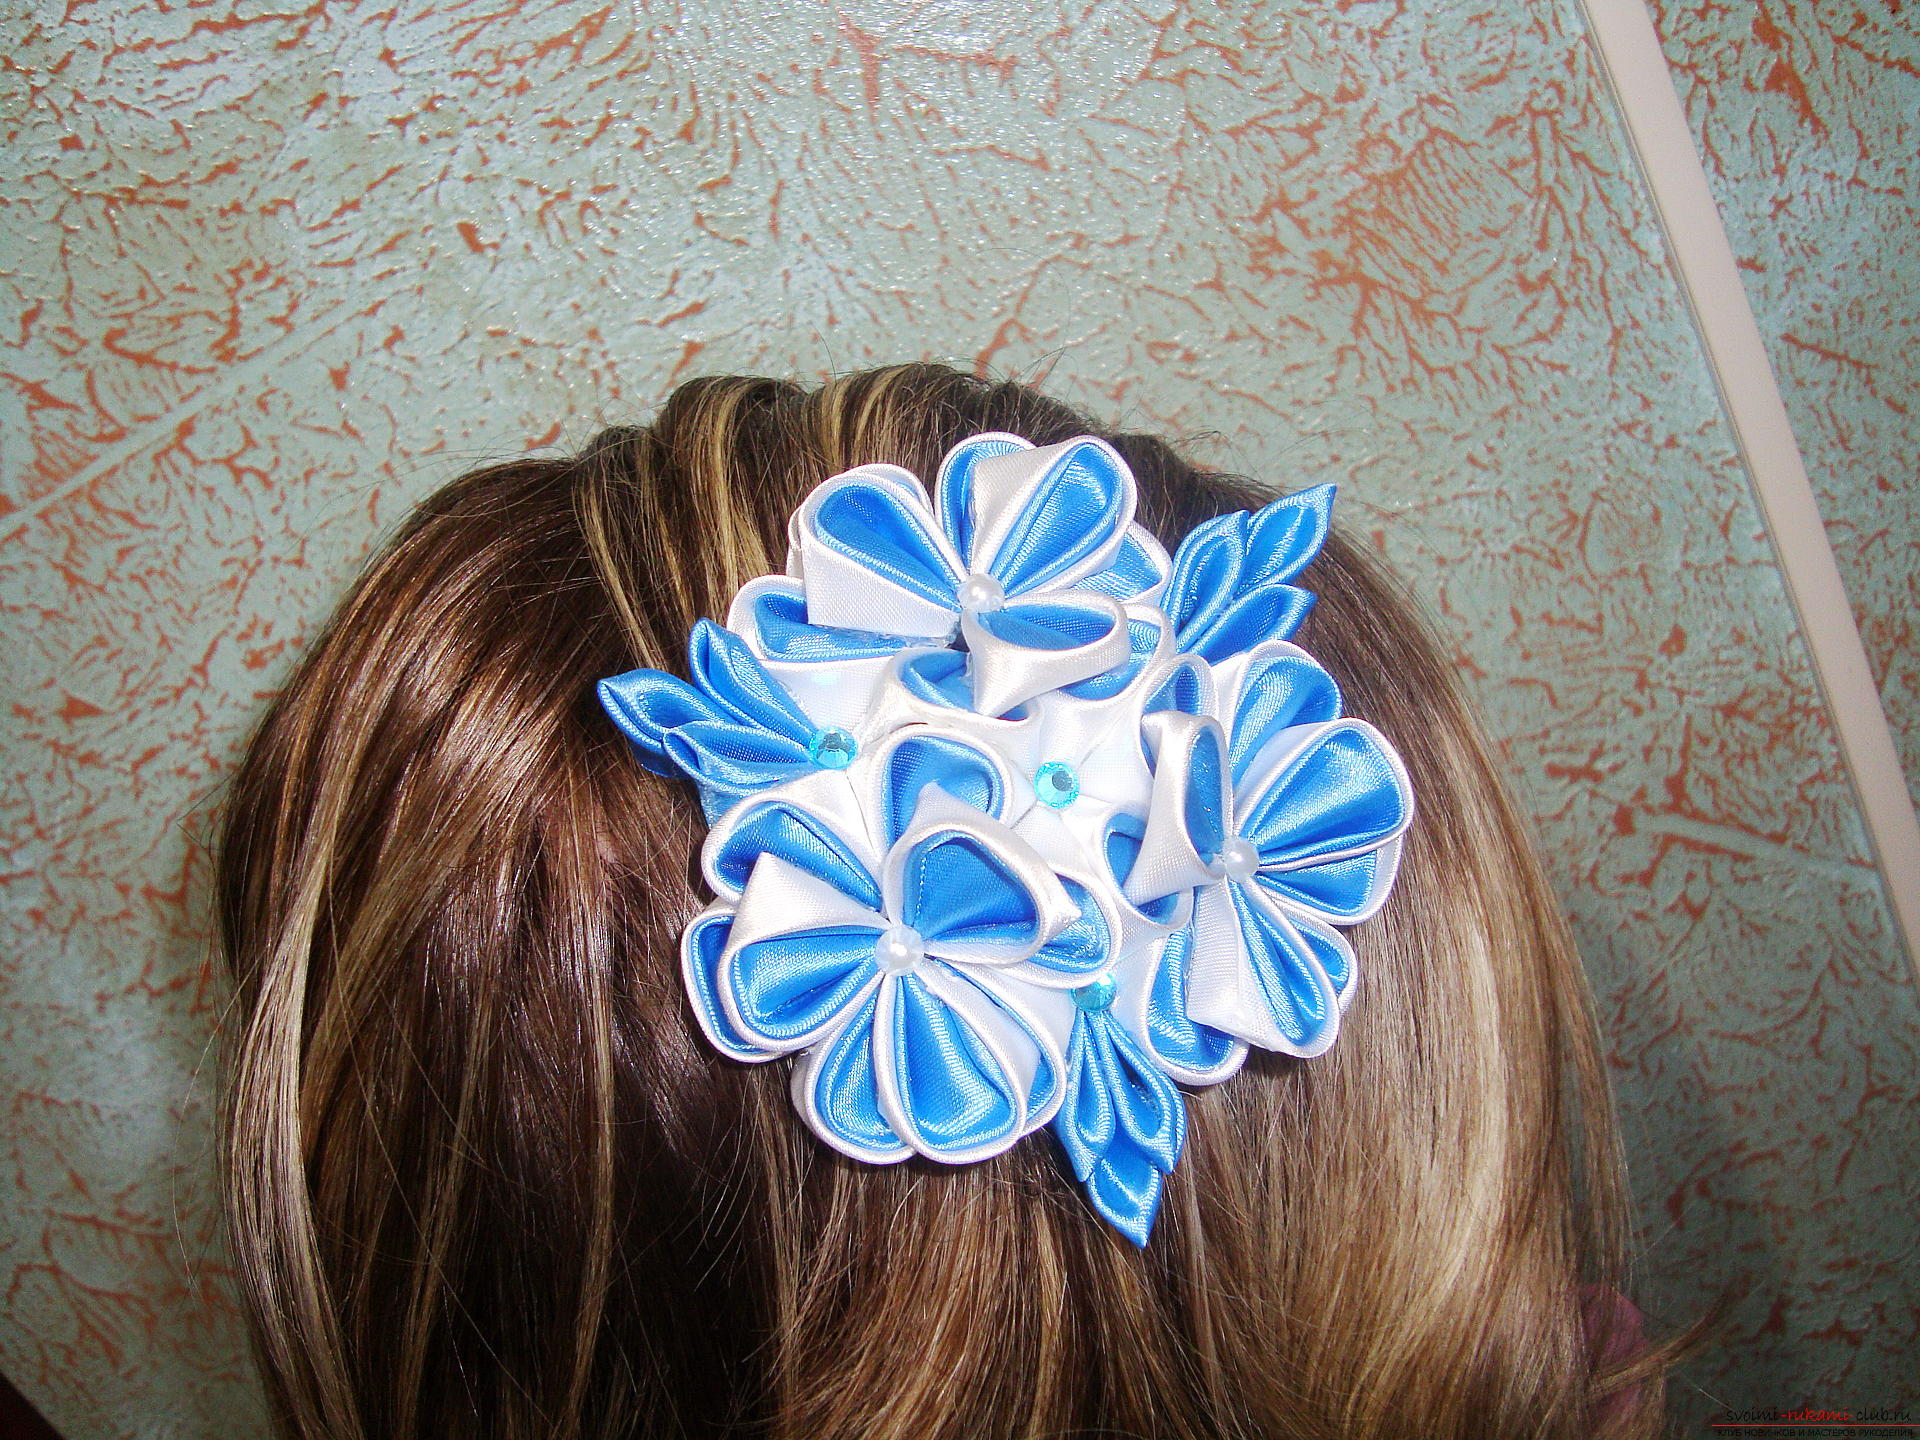 Фото инструкция по изготовлению заколки из лент голубого цвета в технике канзаши. Фото №16